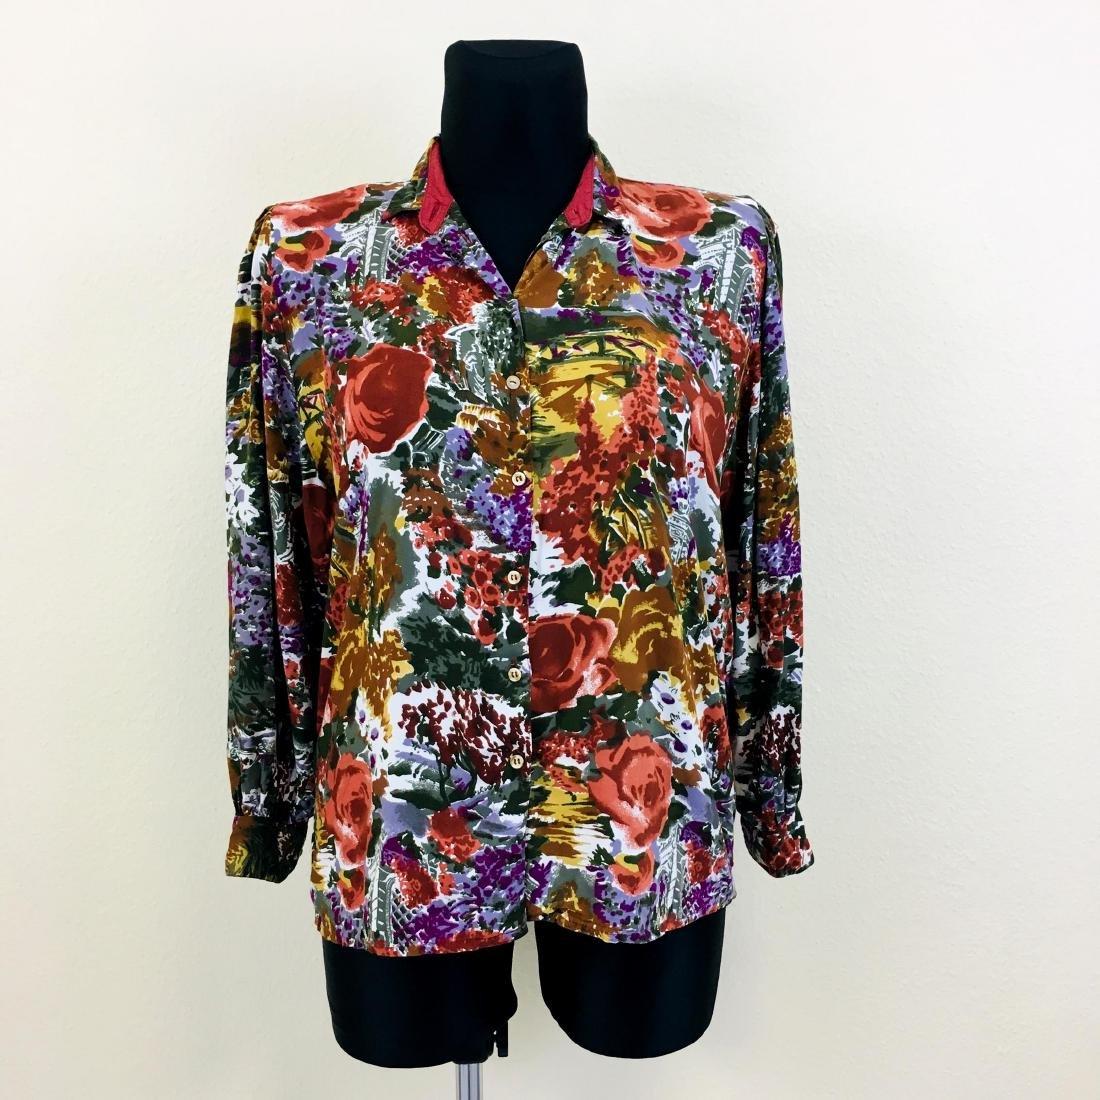 Vintage Women's Gallicia Designer Top Blouse Shirt